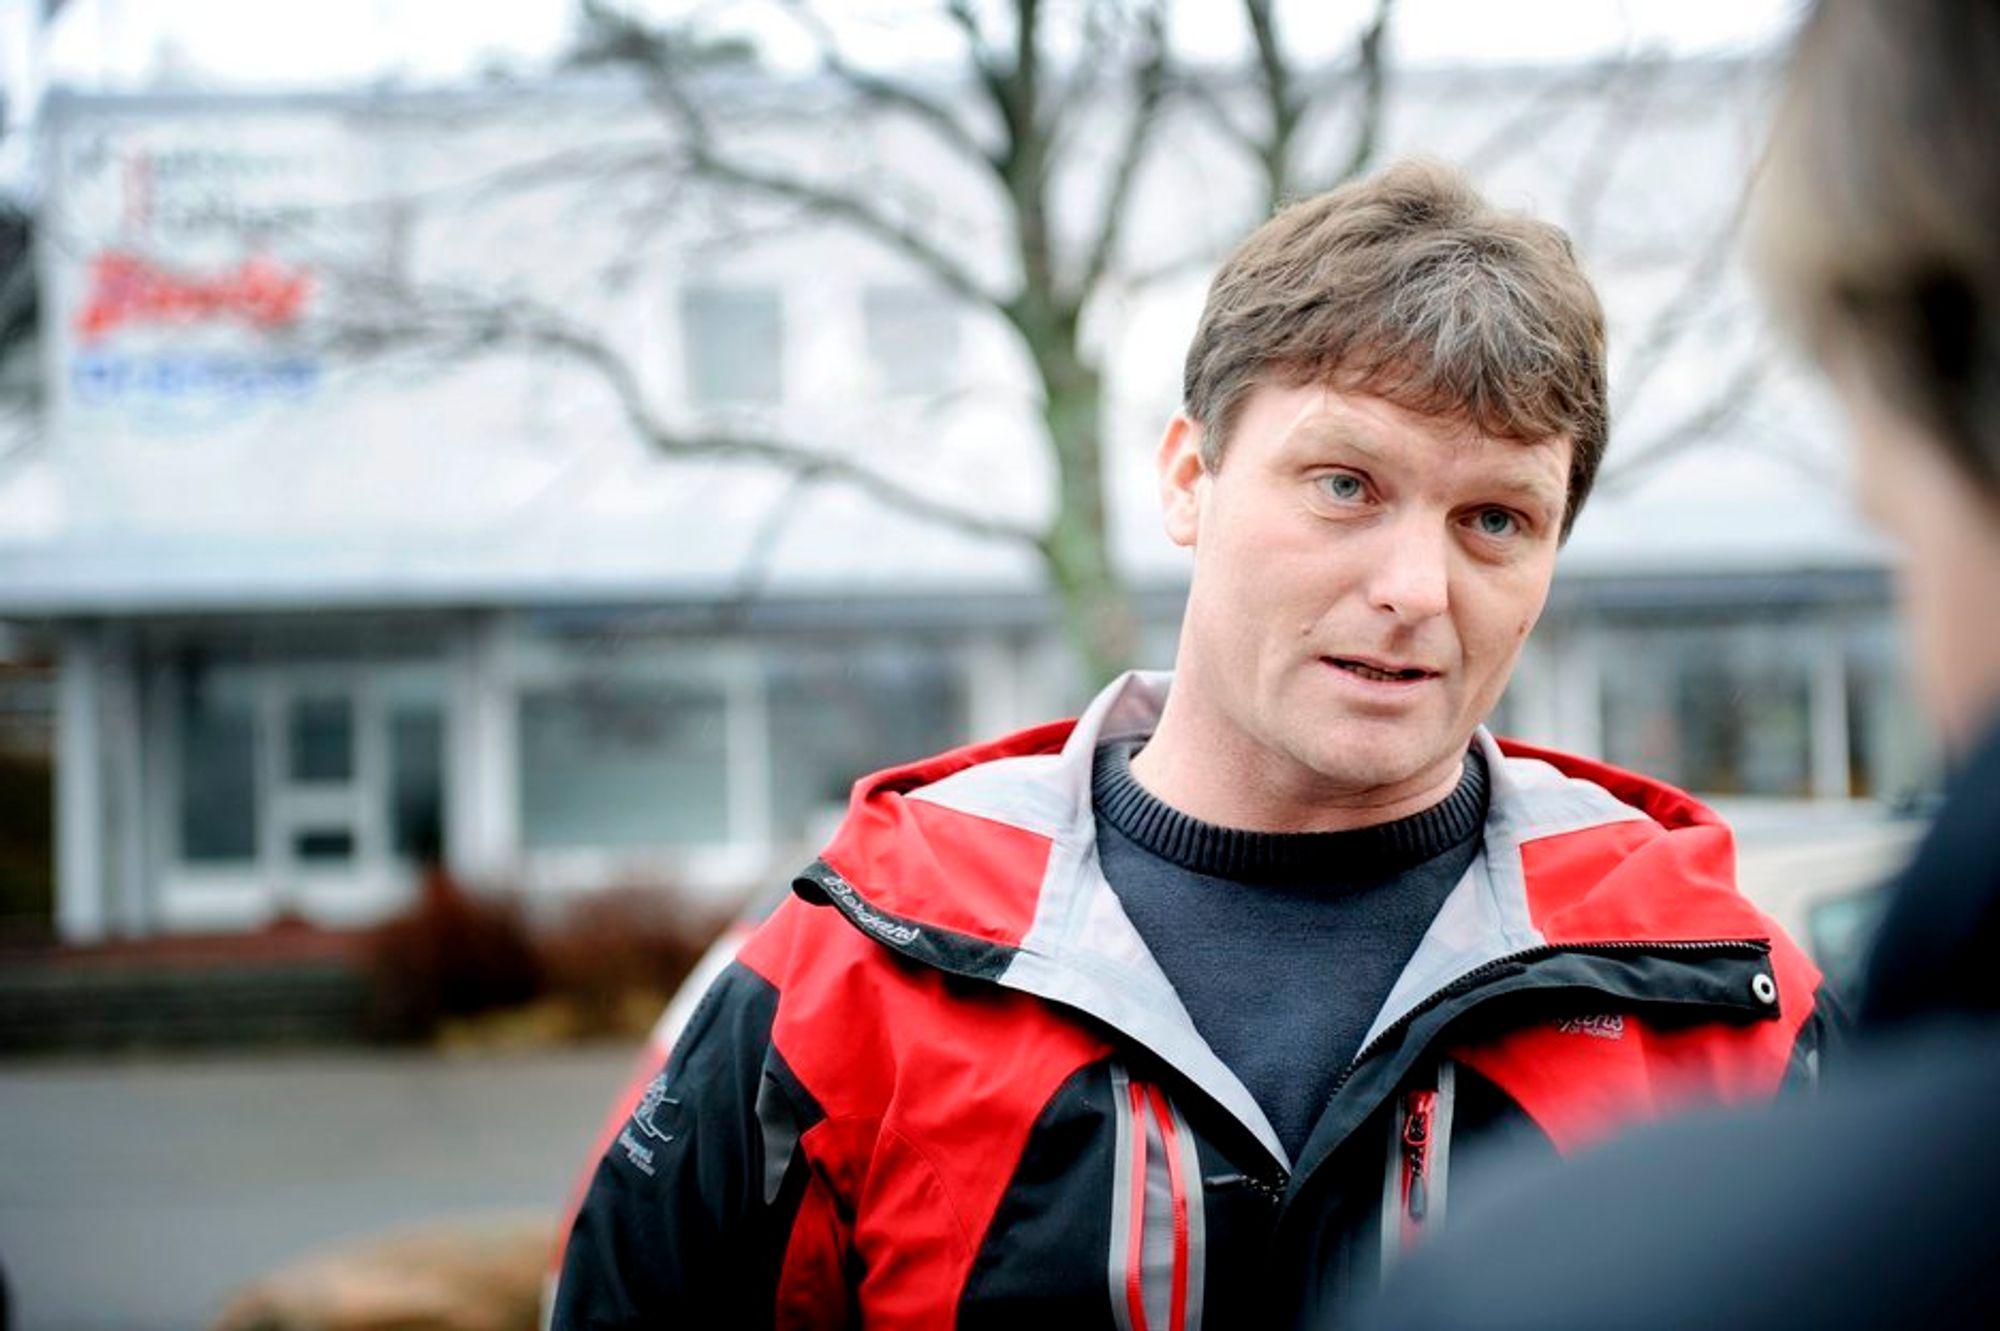 Byggmester Harald Langemyhr skal ifølge en rapport fra PricewaterhouseCoopers (PWC) ha fakturert Oslo kommune for 50.000 falske timer.